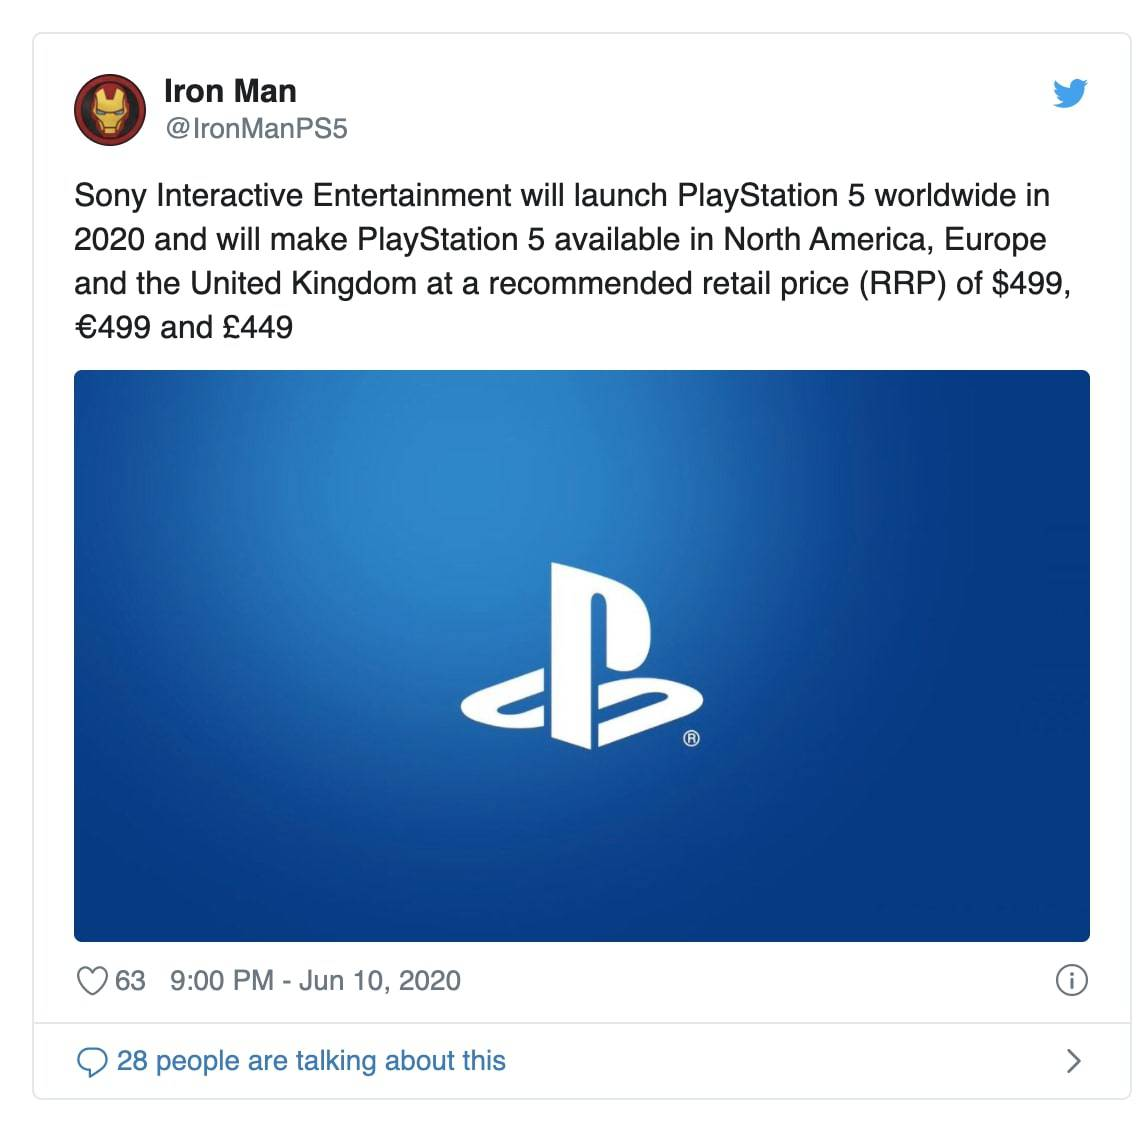 playstation 5 - design